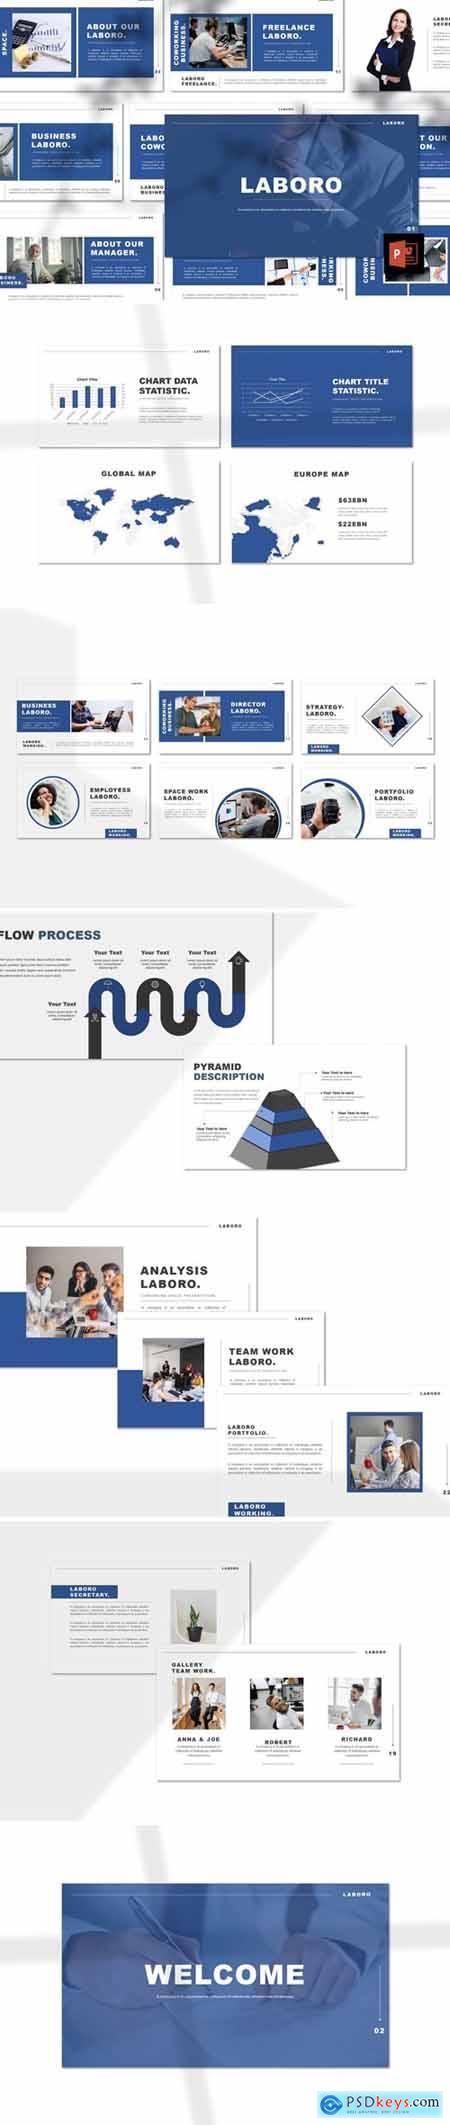 Laboro - Freelancer Powerpoint, Keynote and Google Slides Templates